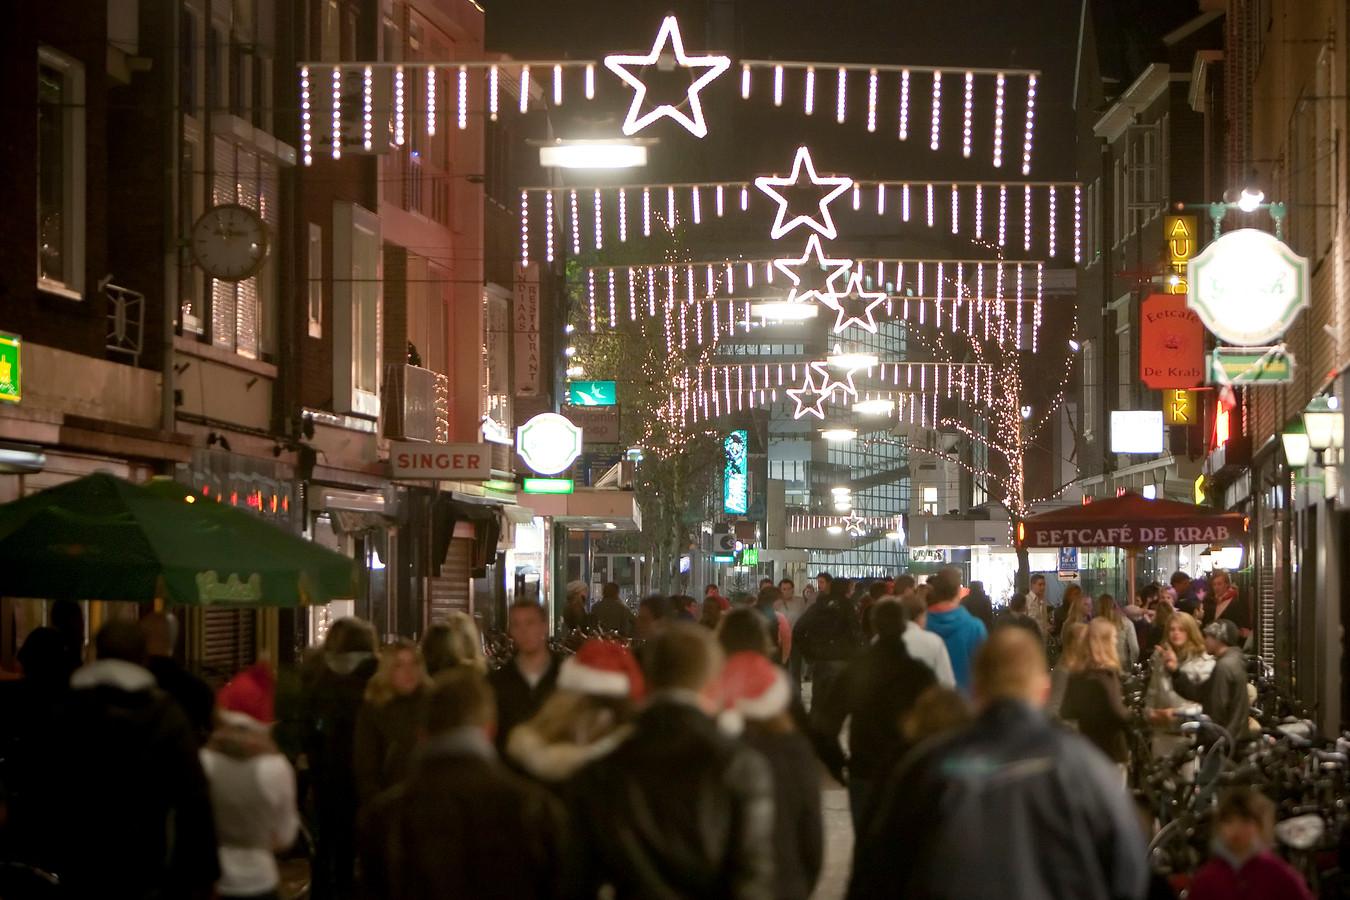 Kerstmiddag in Hengelo